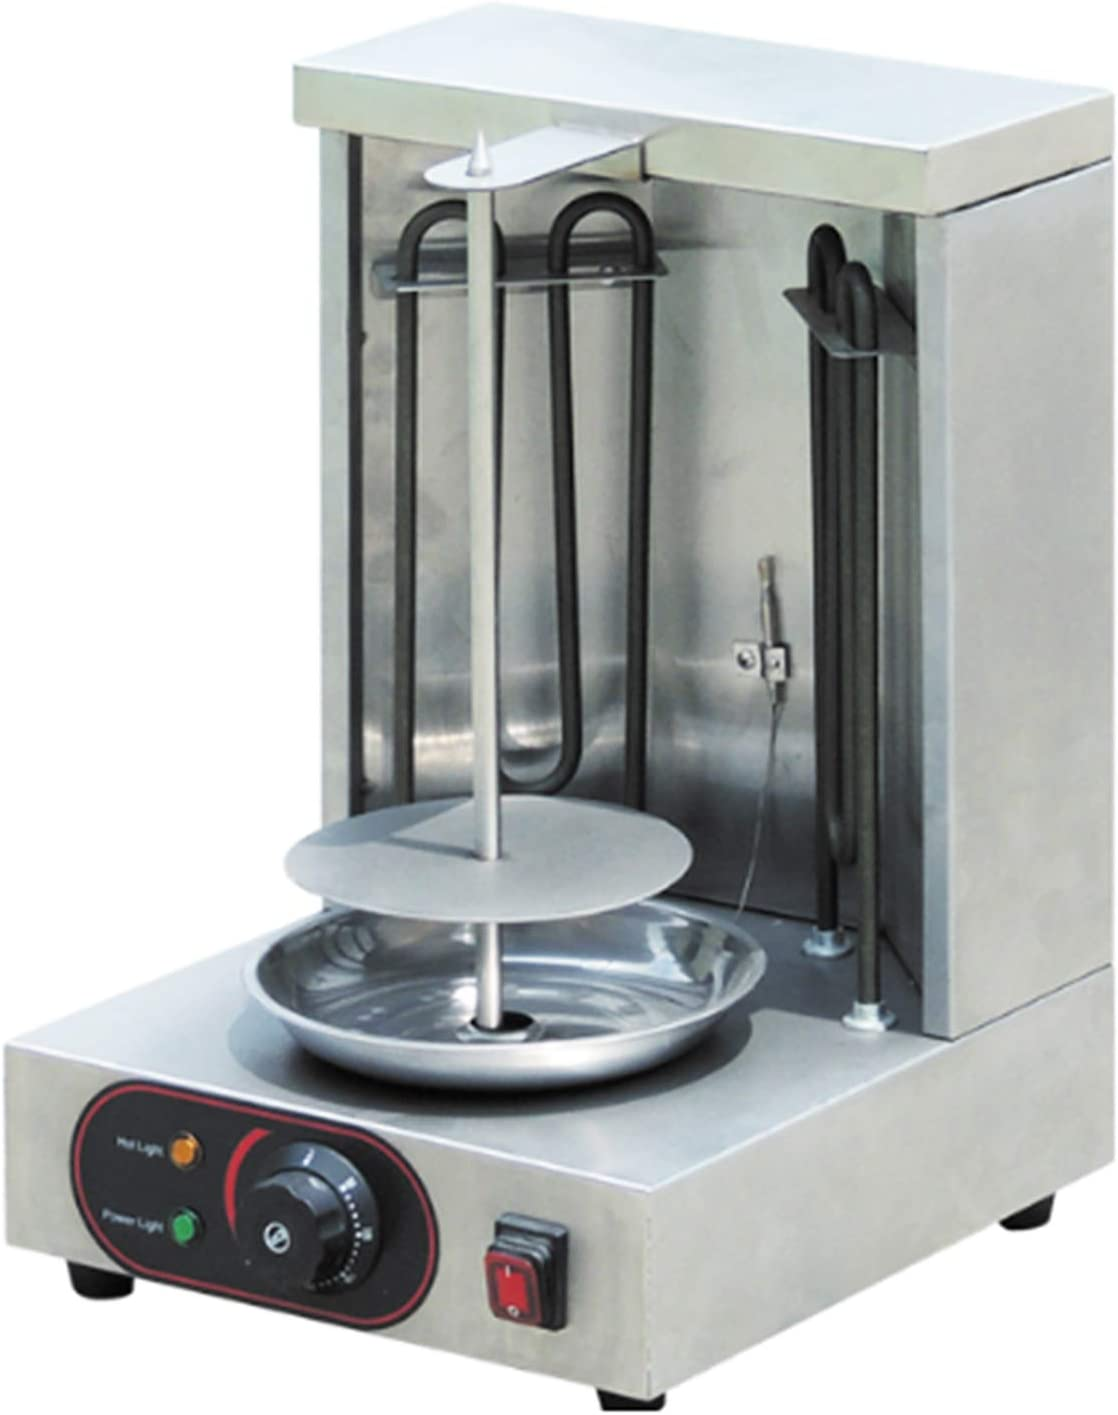 Shawarma Grill Machine Electric Doner Kebab Machine Mini Gyro Machine 2 Burners Vertical Broiler Meat Capacity 11lbs